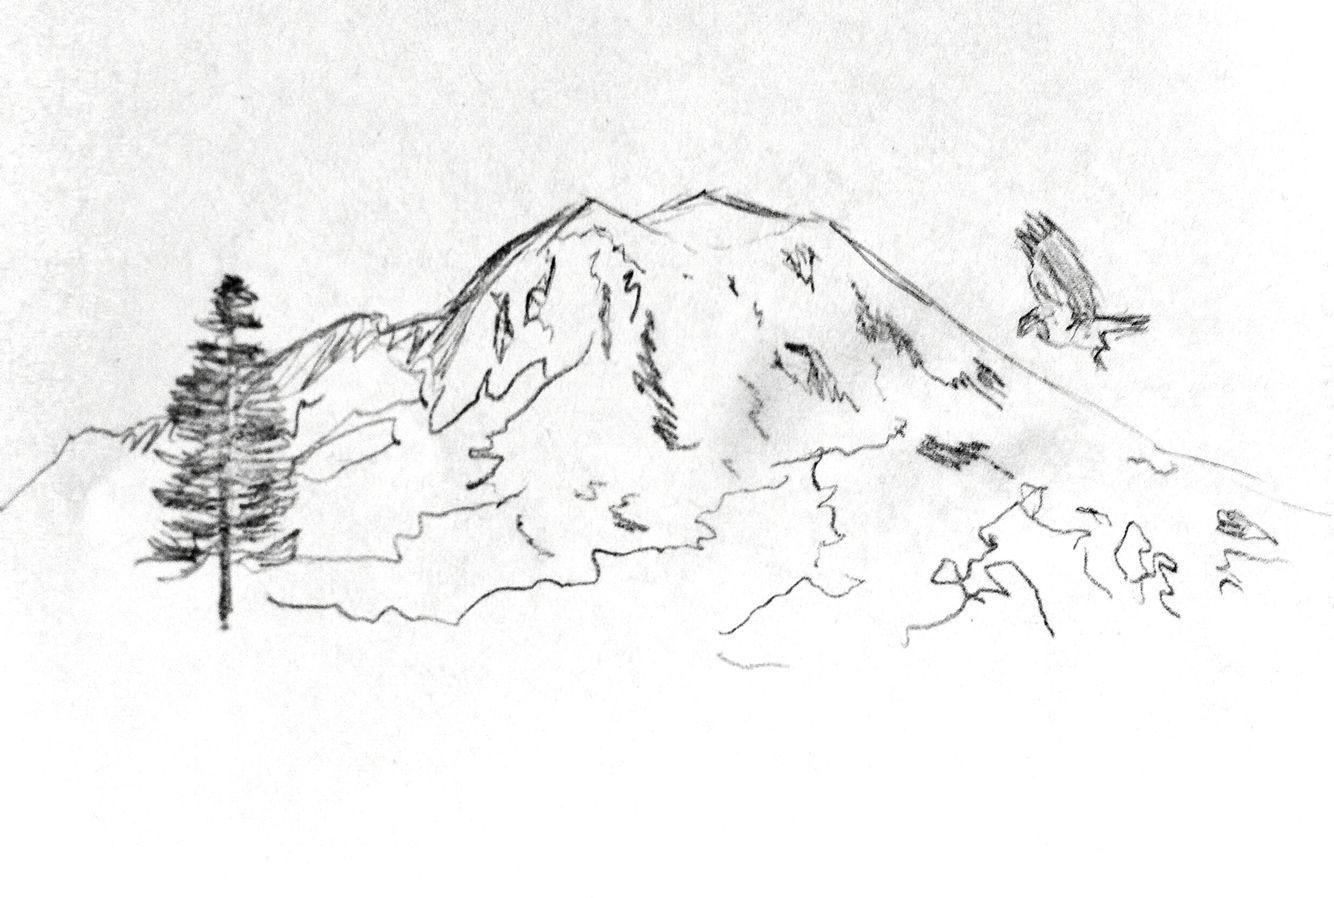 Mount rainier clipart clip library download My sketch for mountain tattoo - Mt. Rainier inspiration ... clip library download